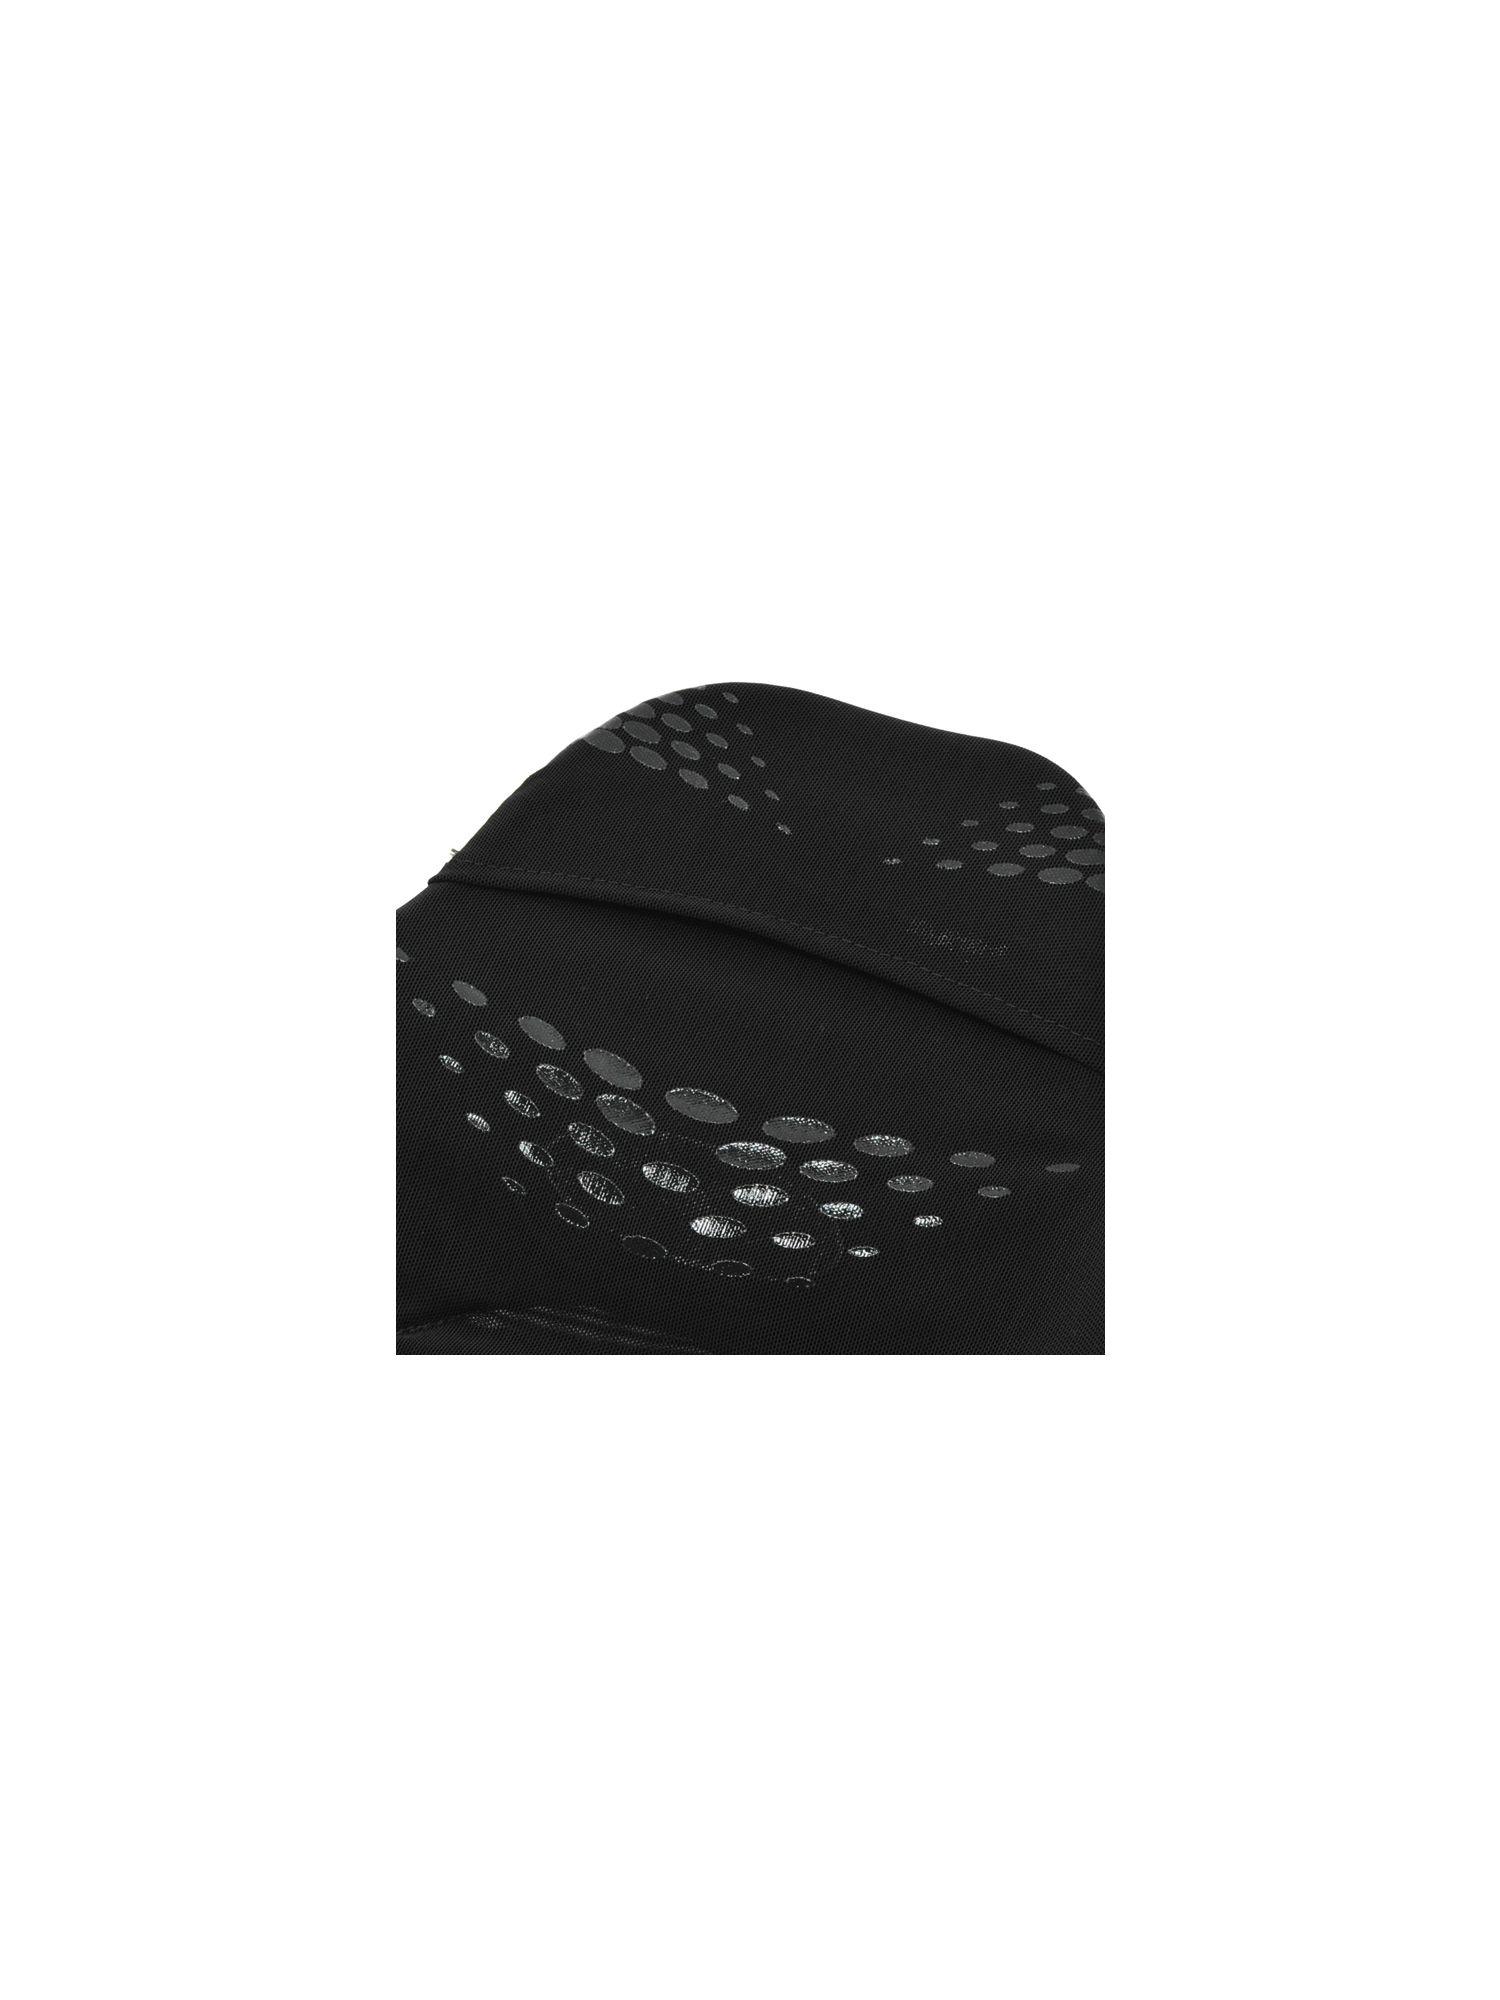 NXV011 | フレックス チェストプロテクター[1color]